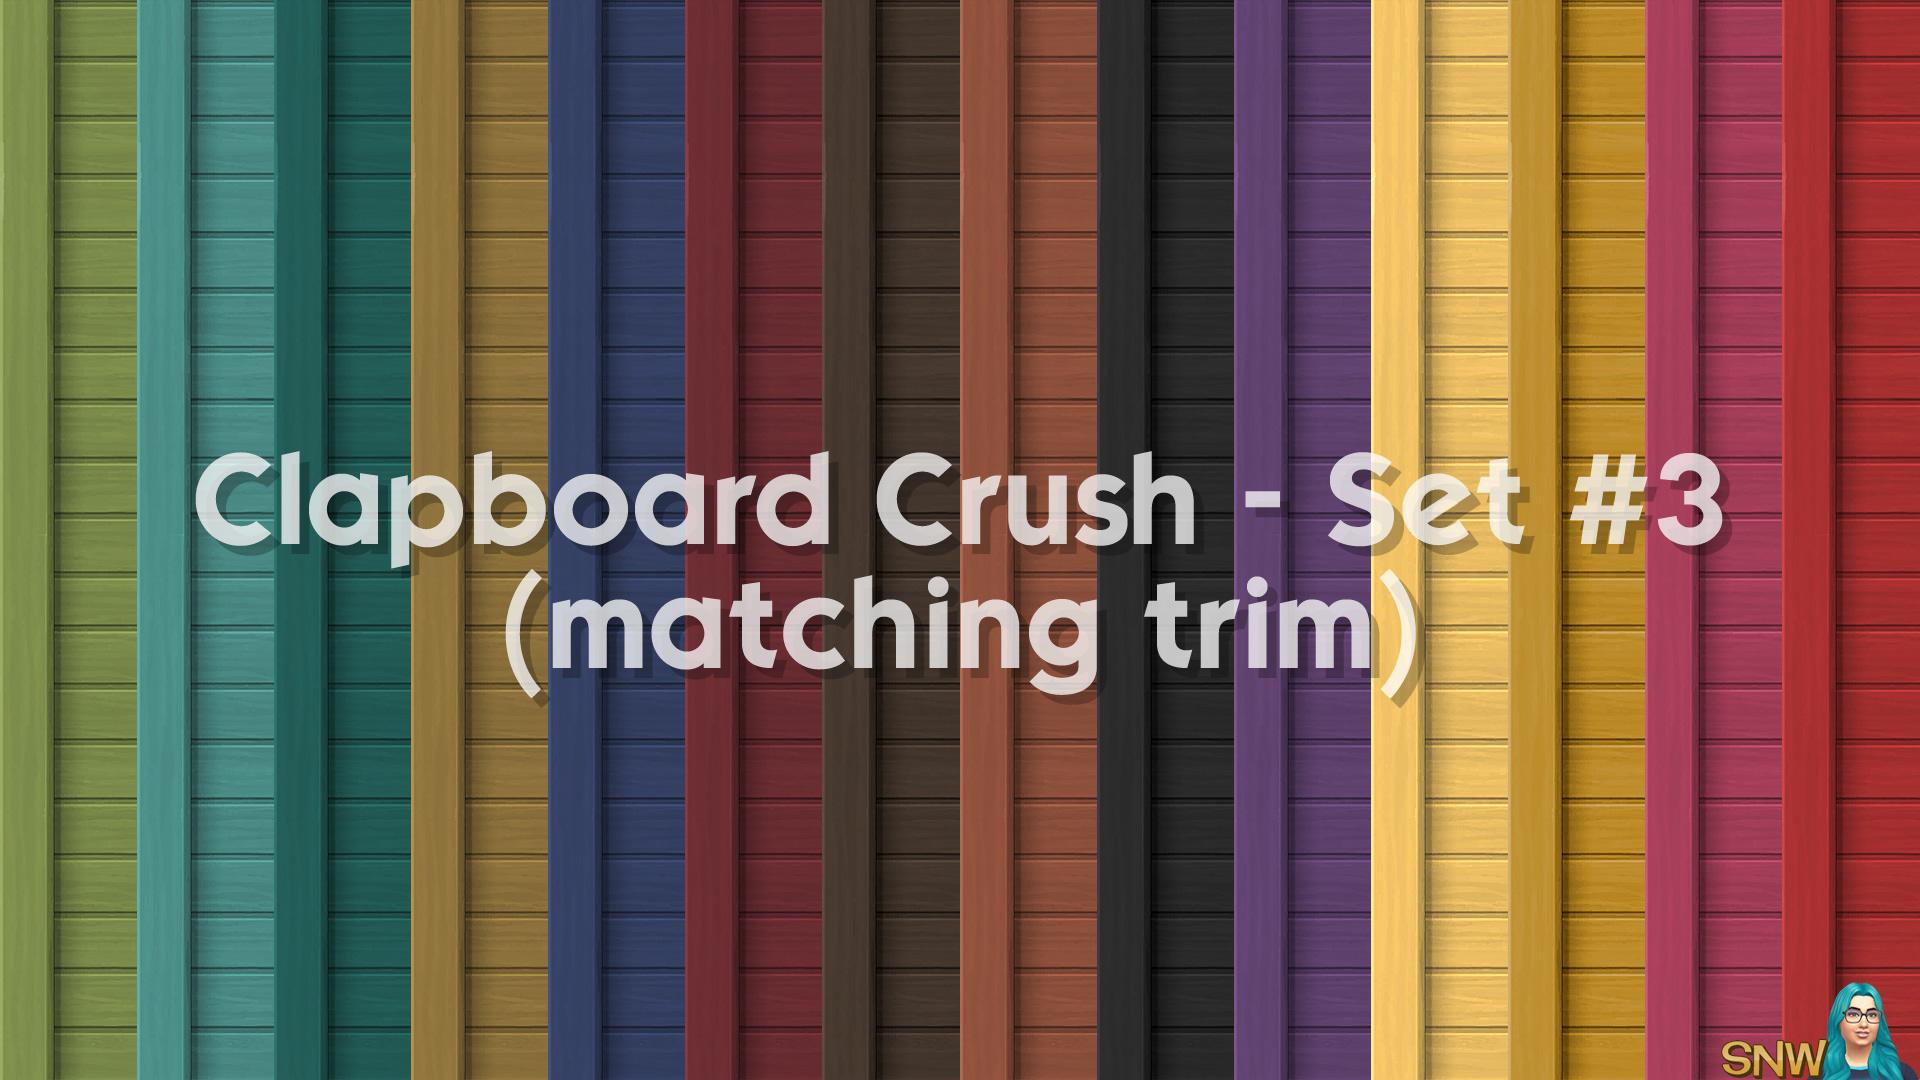 Clapboard Crush Siding Walls Set #3 (with Corner Trim)